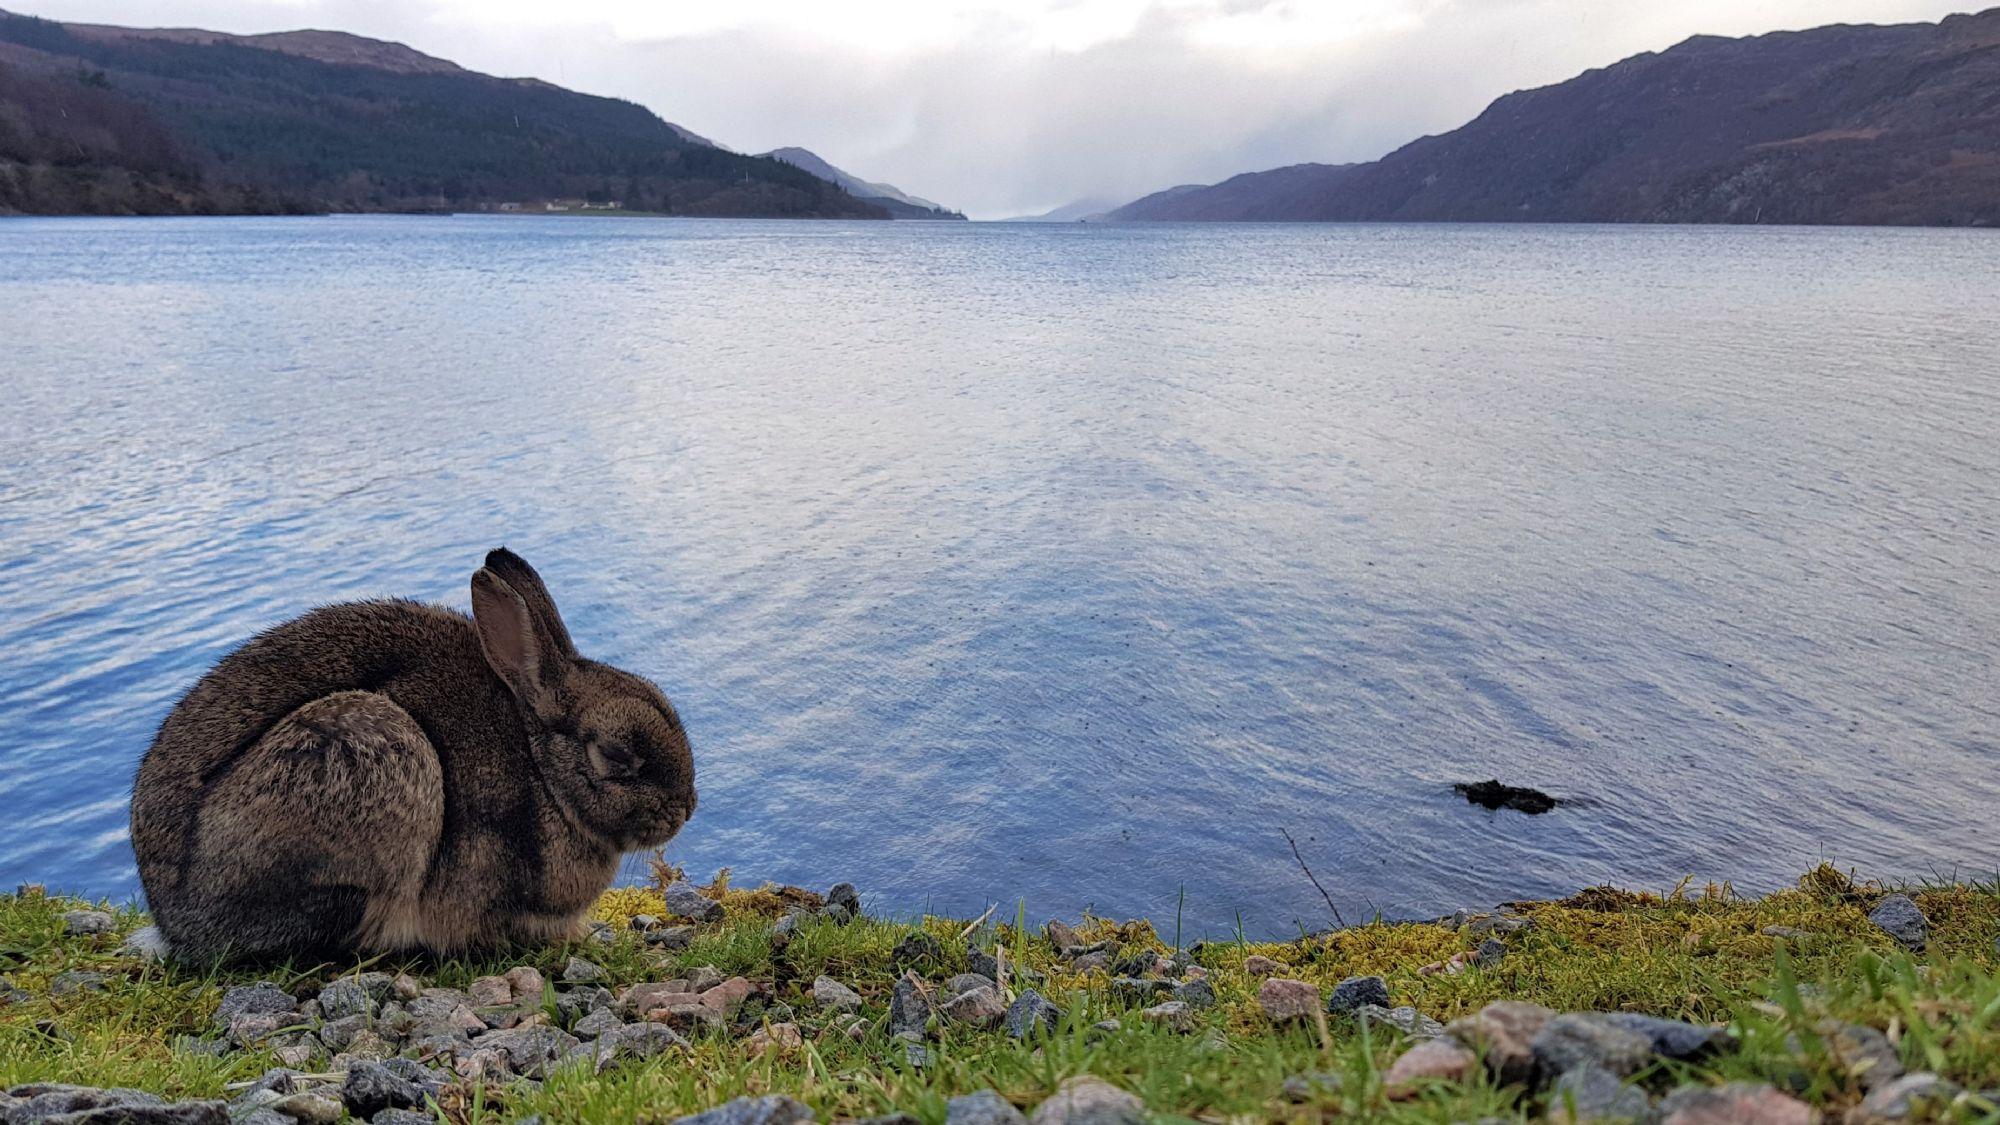 Loch Ness rabbit